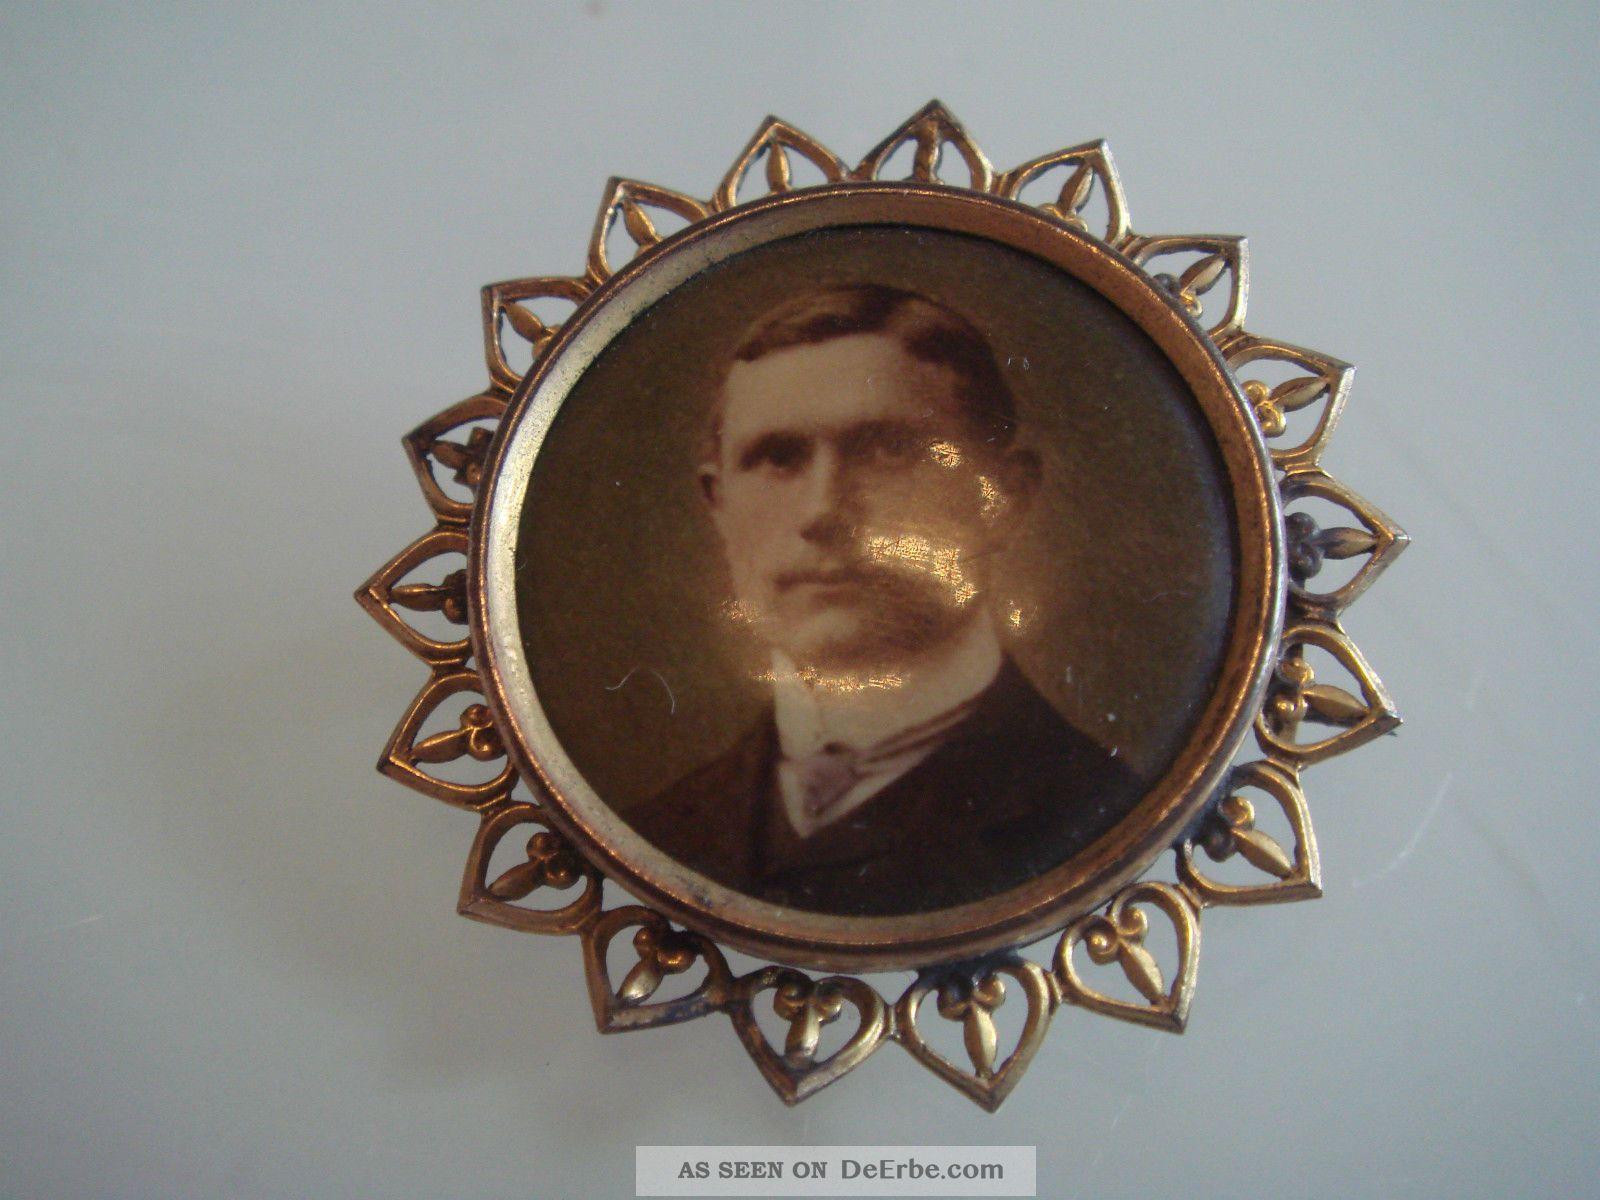 Antike Jugendstil Art Nouveau Brosche Photo Medaillon Aus Schaumgold Unikat